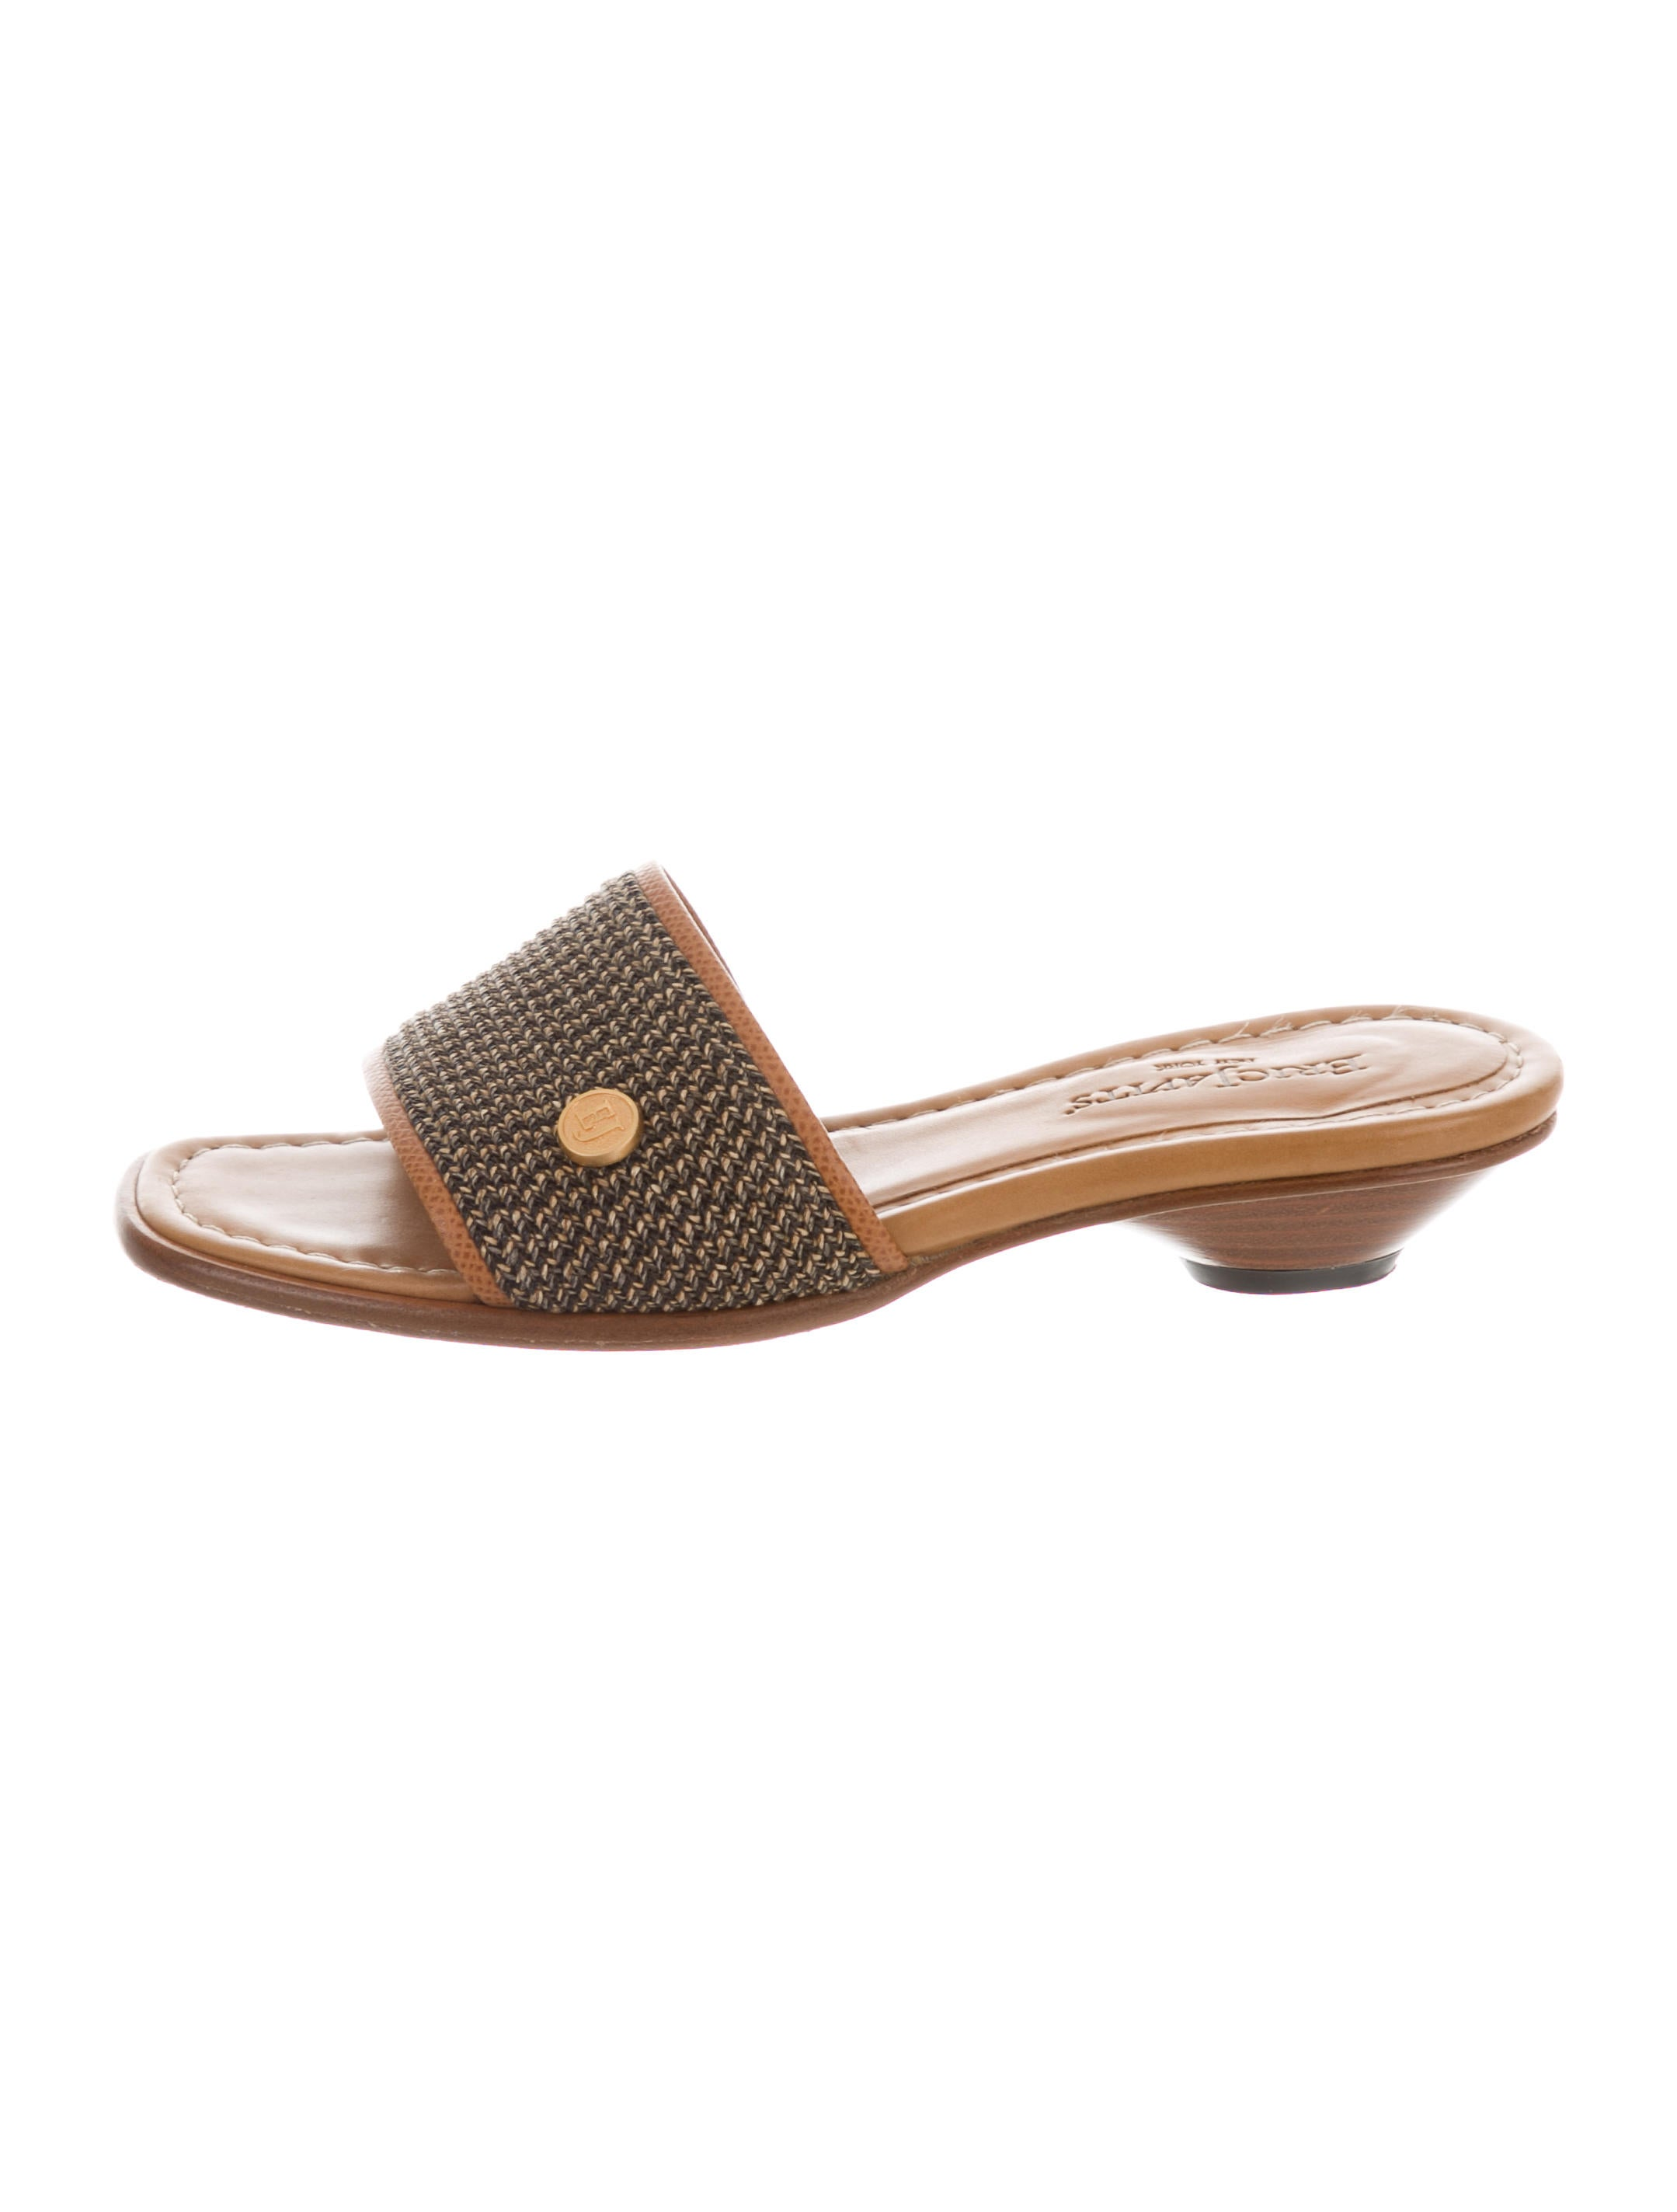 Eric Javits Logo Raffia Slide Sandals free shipping visit explore for sale free shipping fake cmMK4